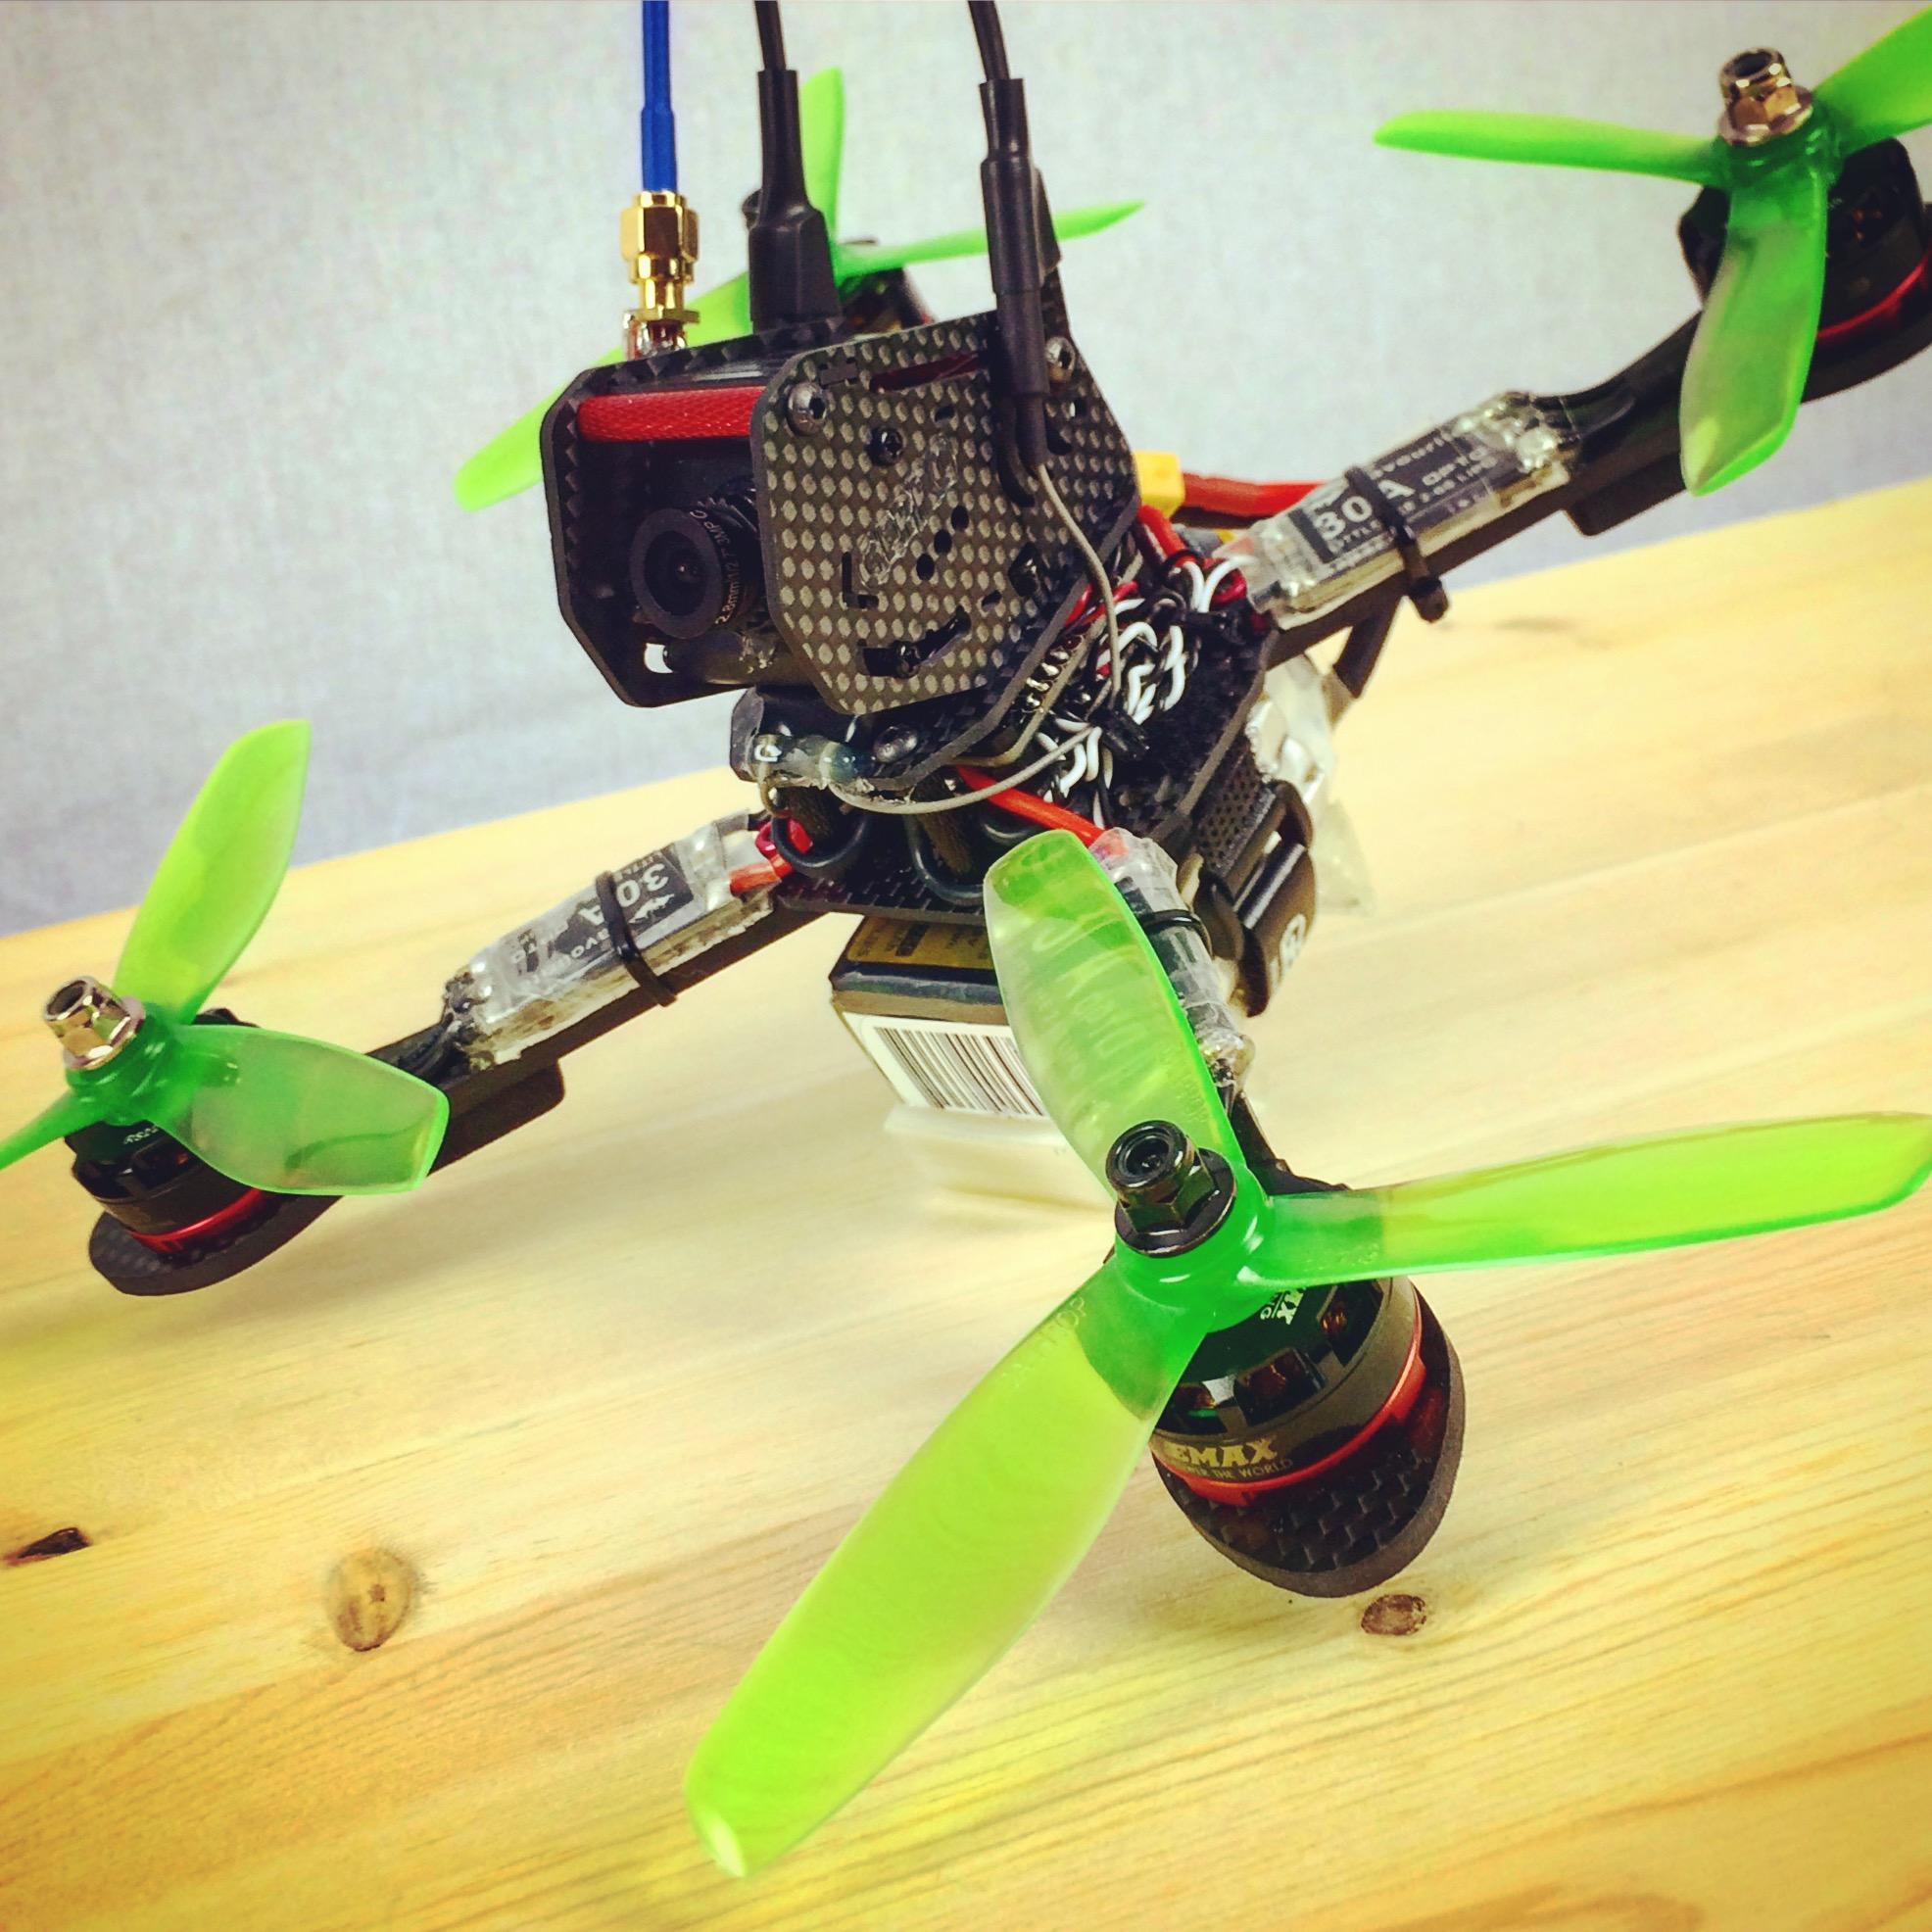 mkme.org race drone